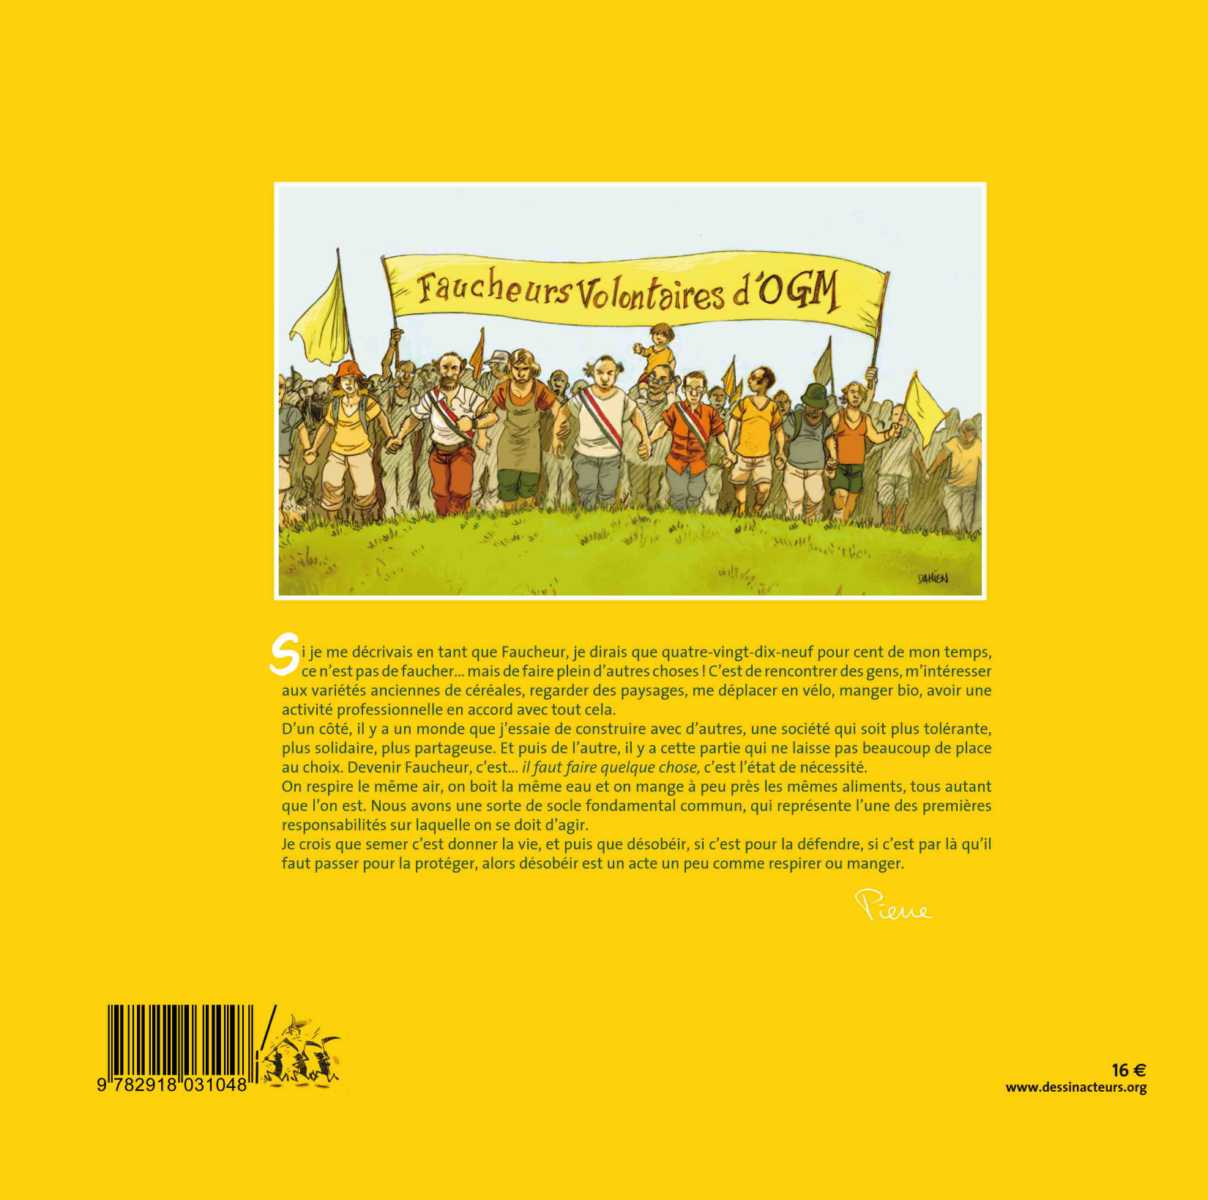 dos_album_FV_1600x1200_.jpg